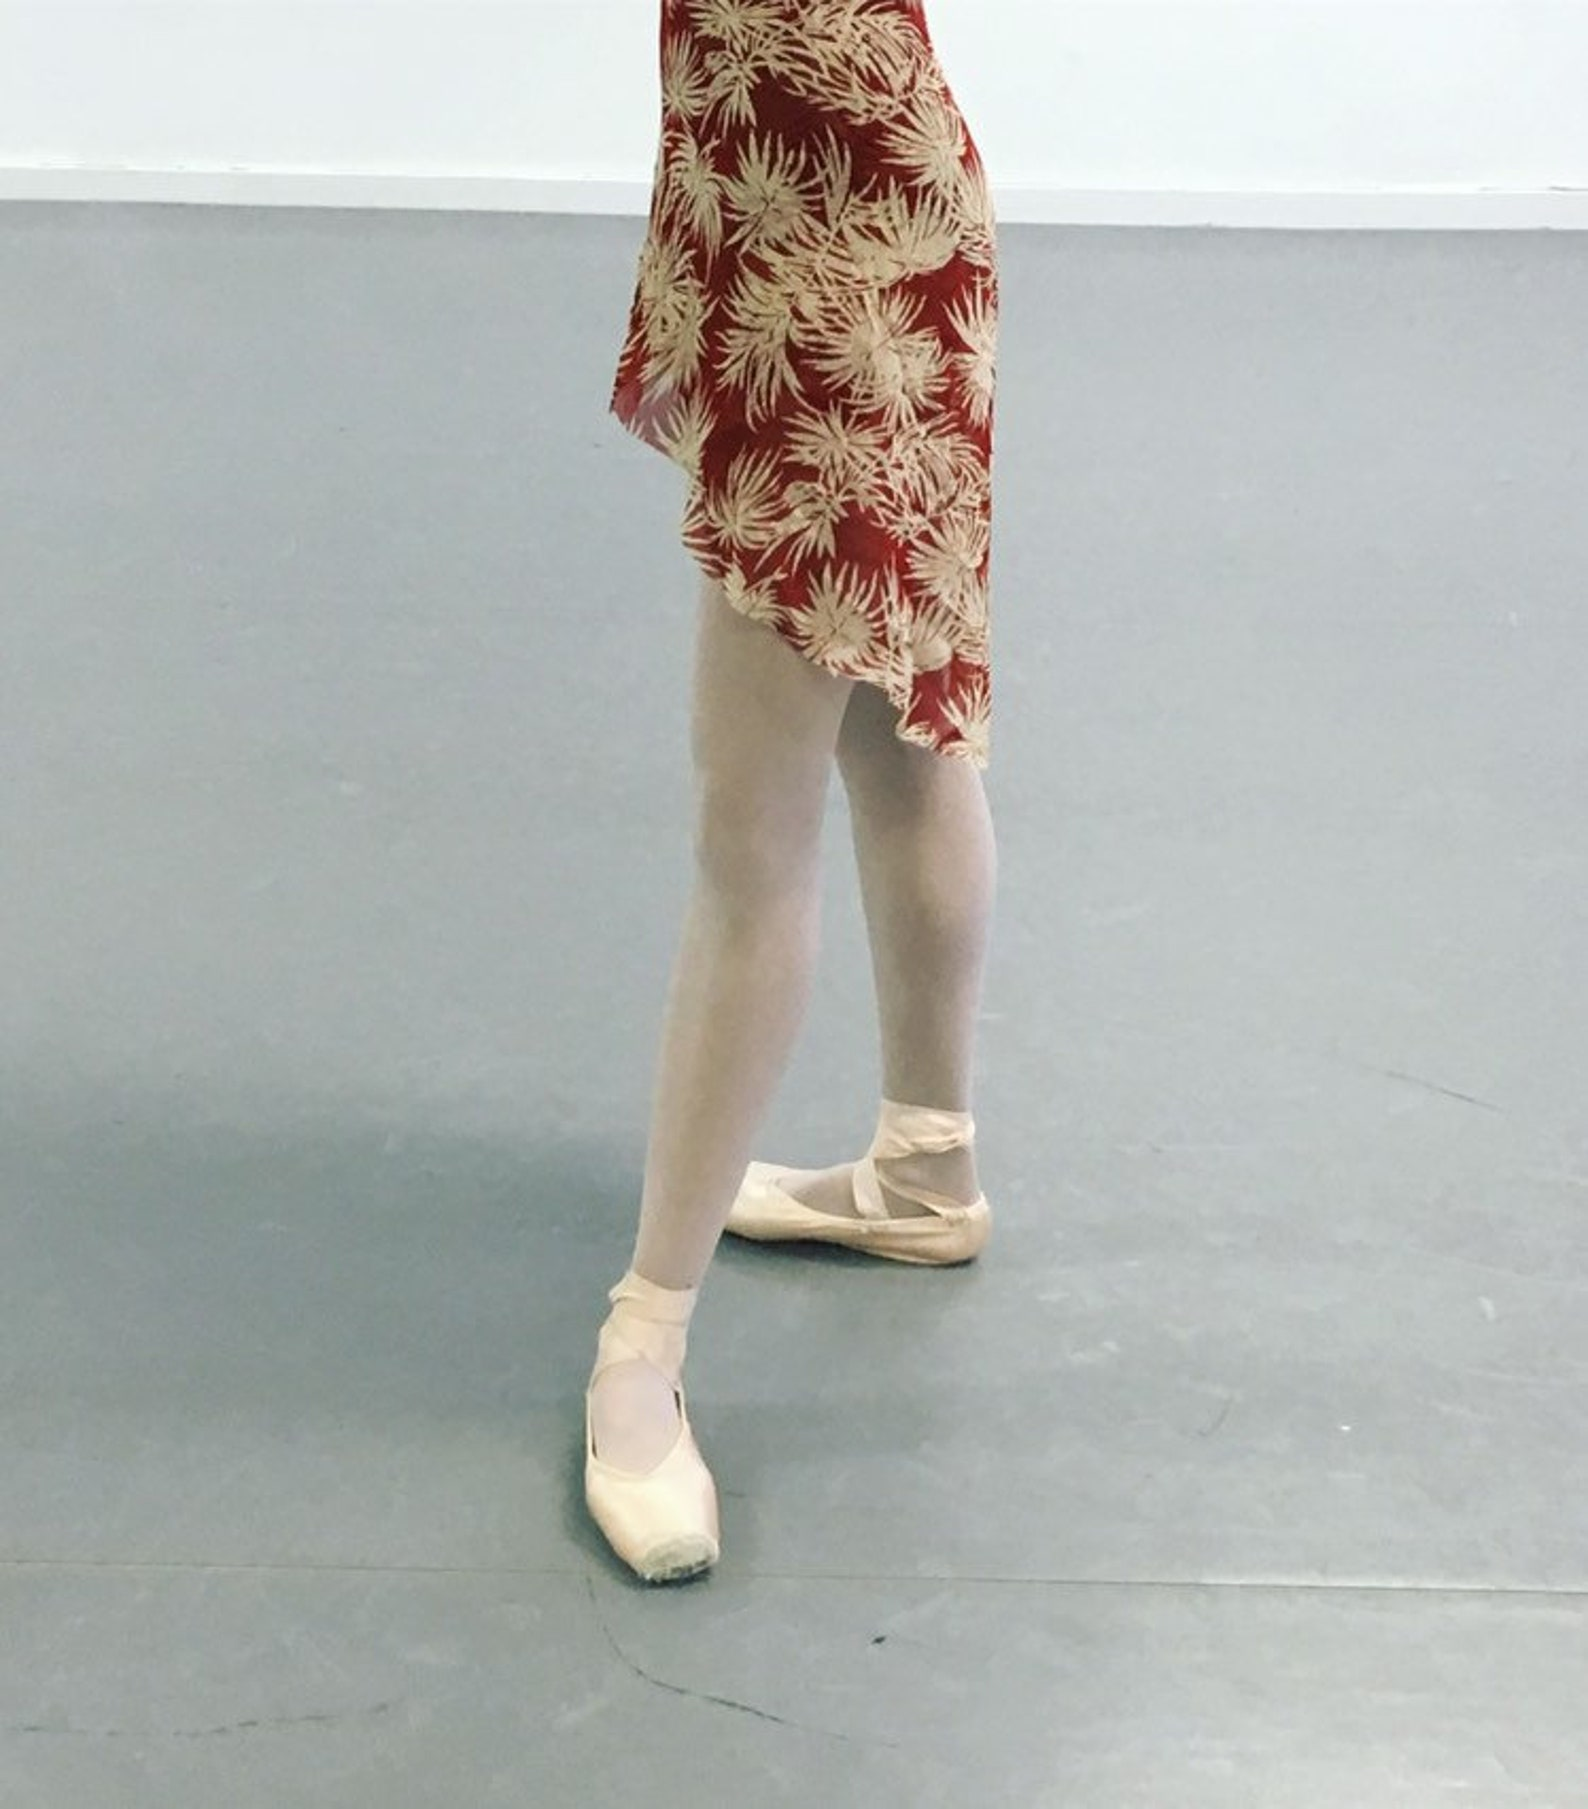 new! toi toi toi ballet wrap skirt long style! rehearsal, class, performance. floral print.